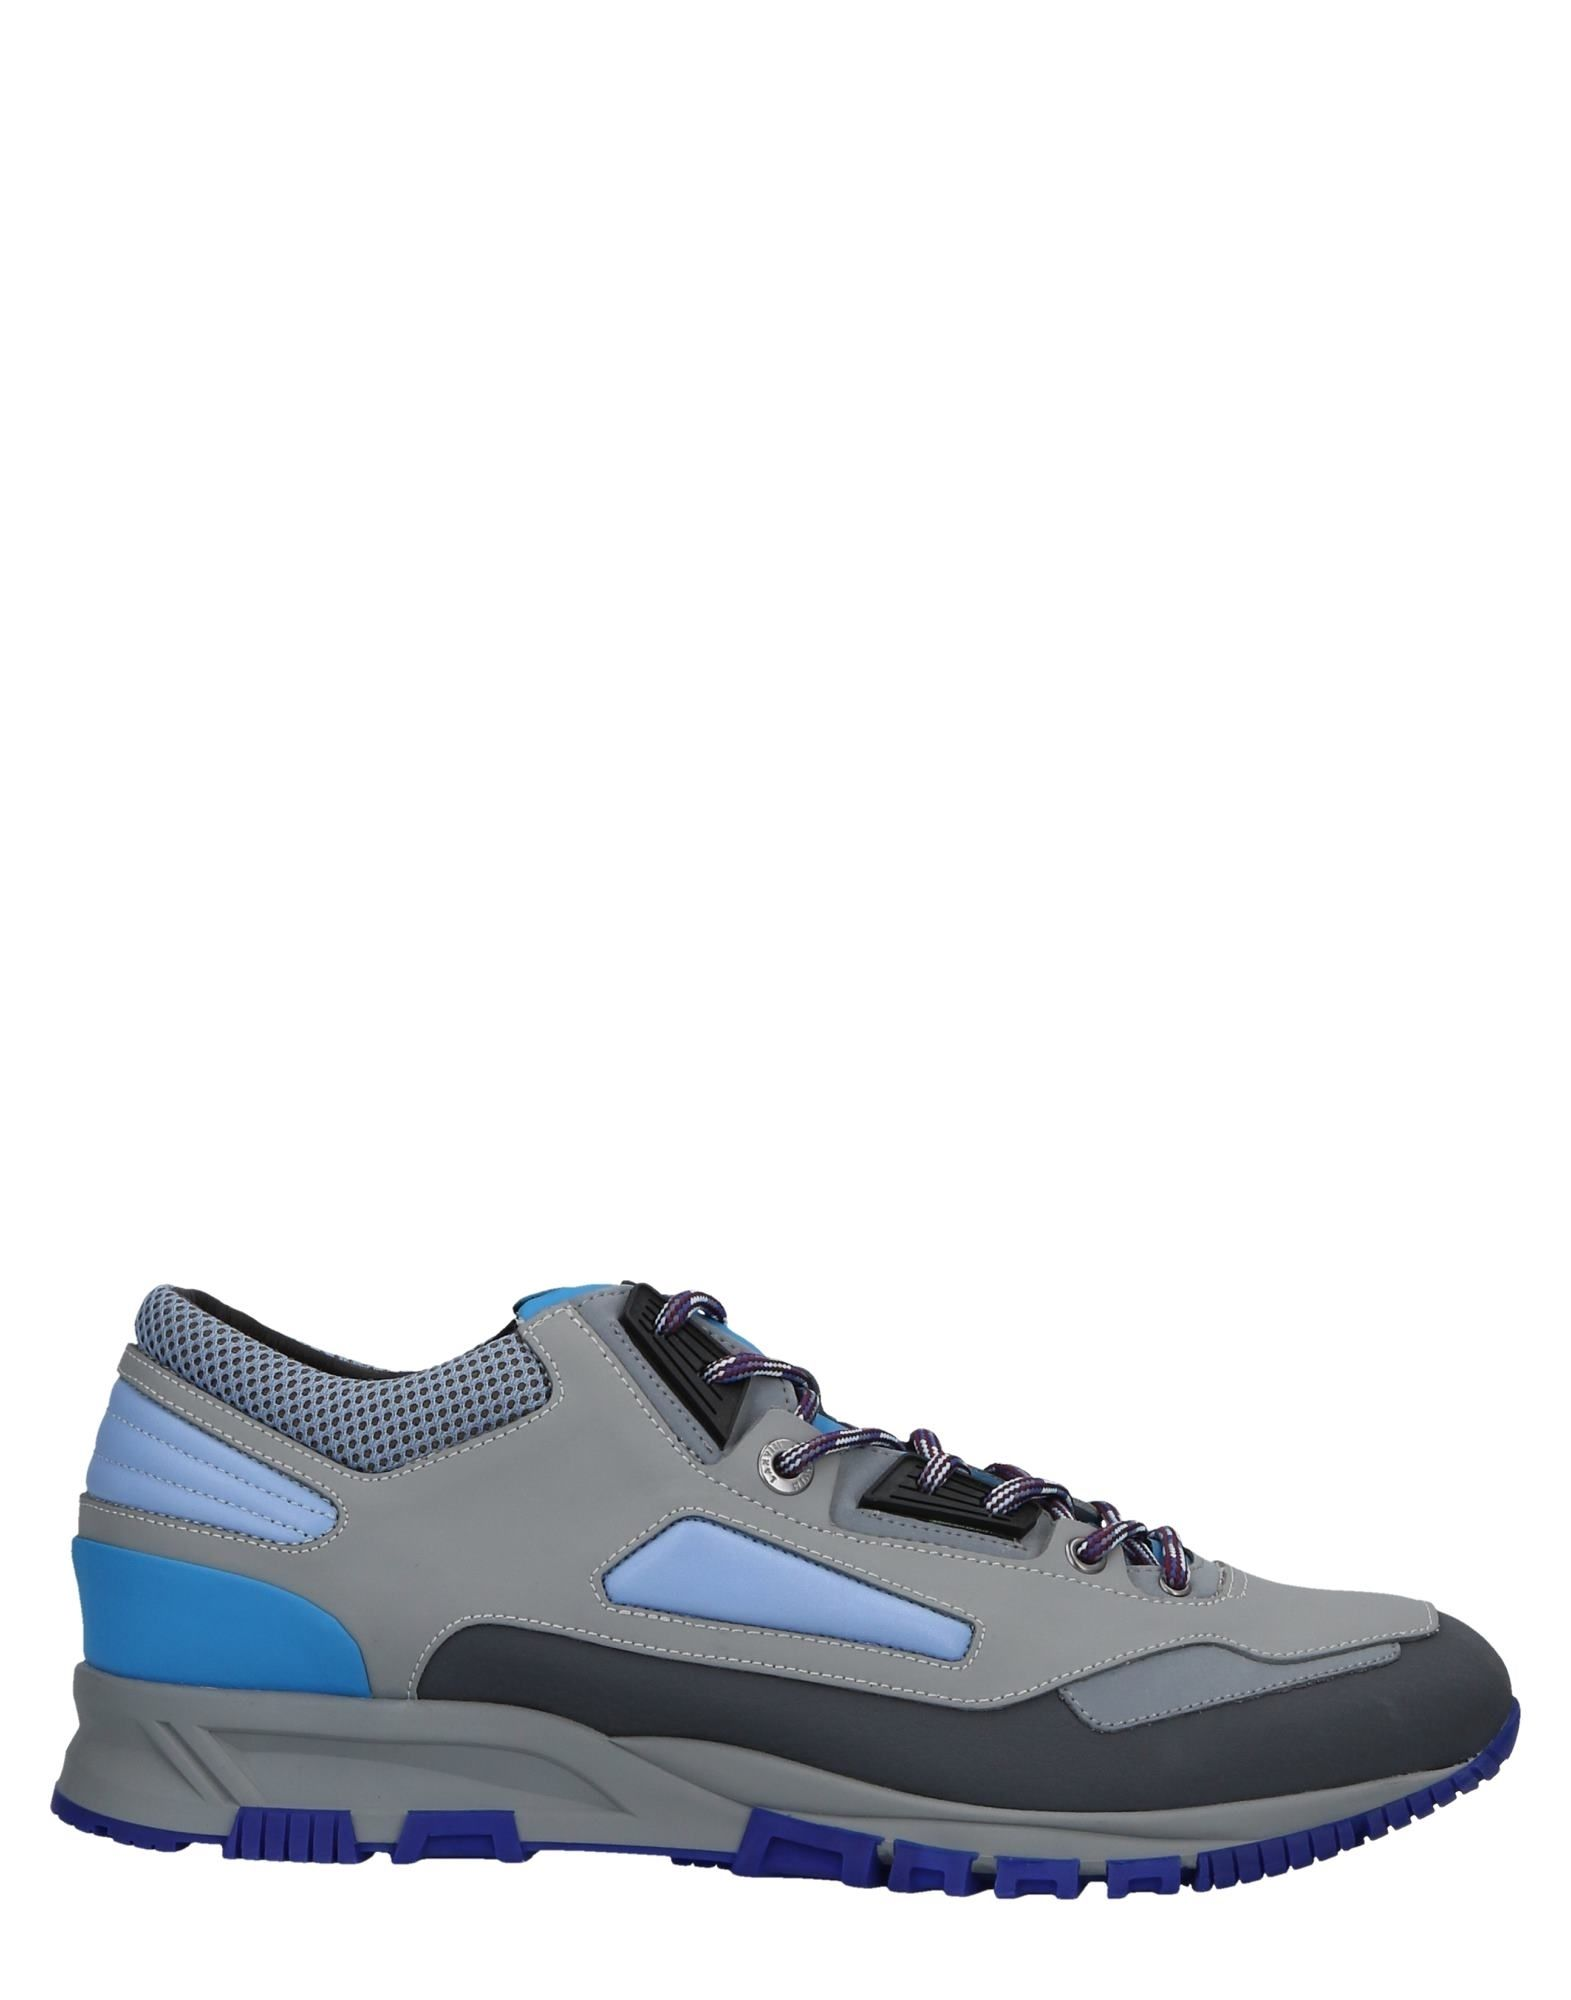 Lanvin Sneakers Herren  11514098MU Gute Qualität beliebte Schuhe